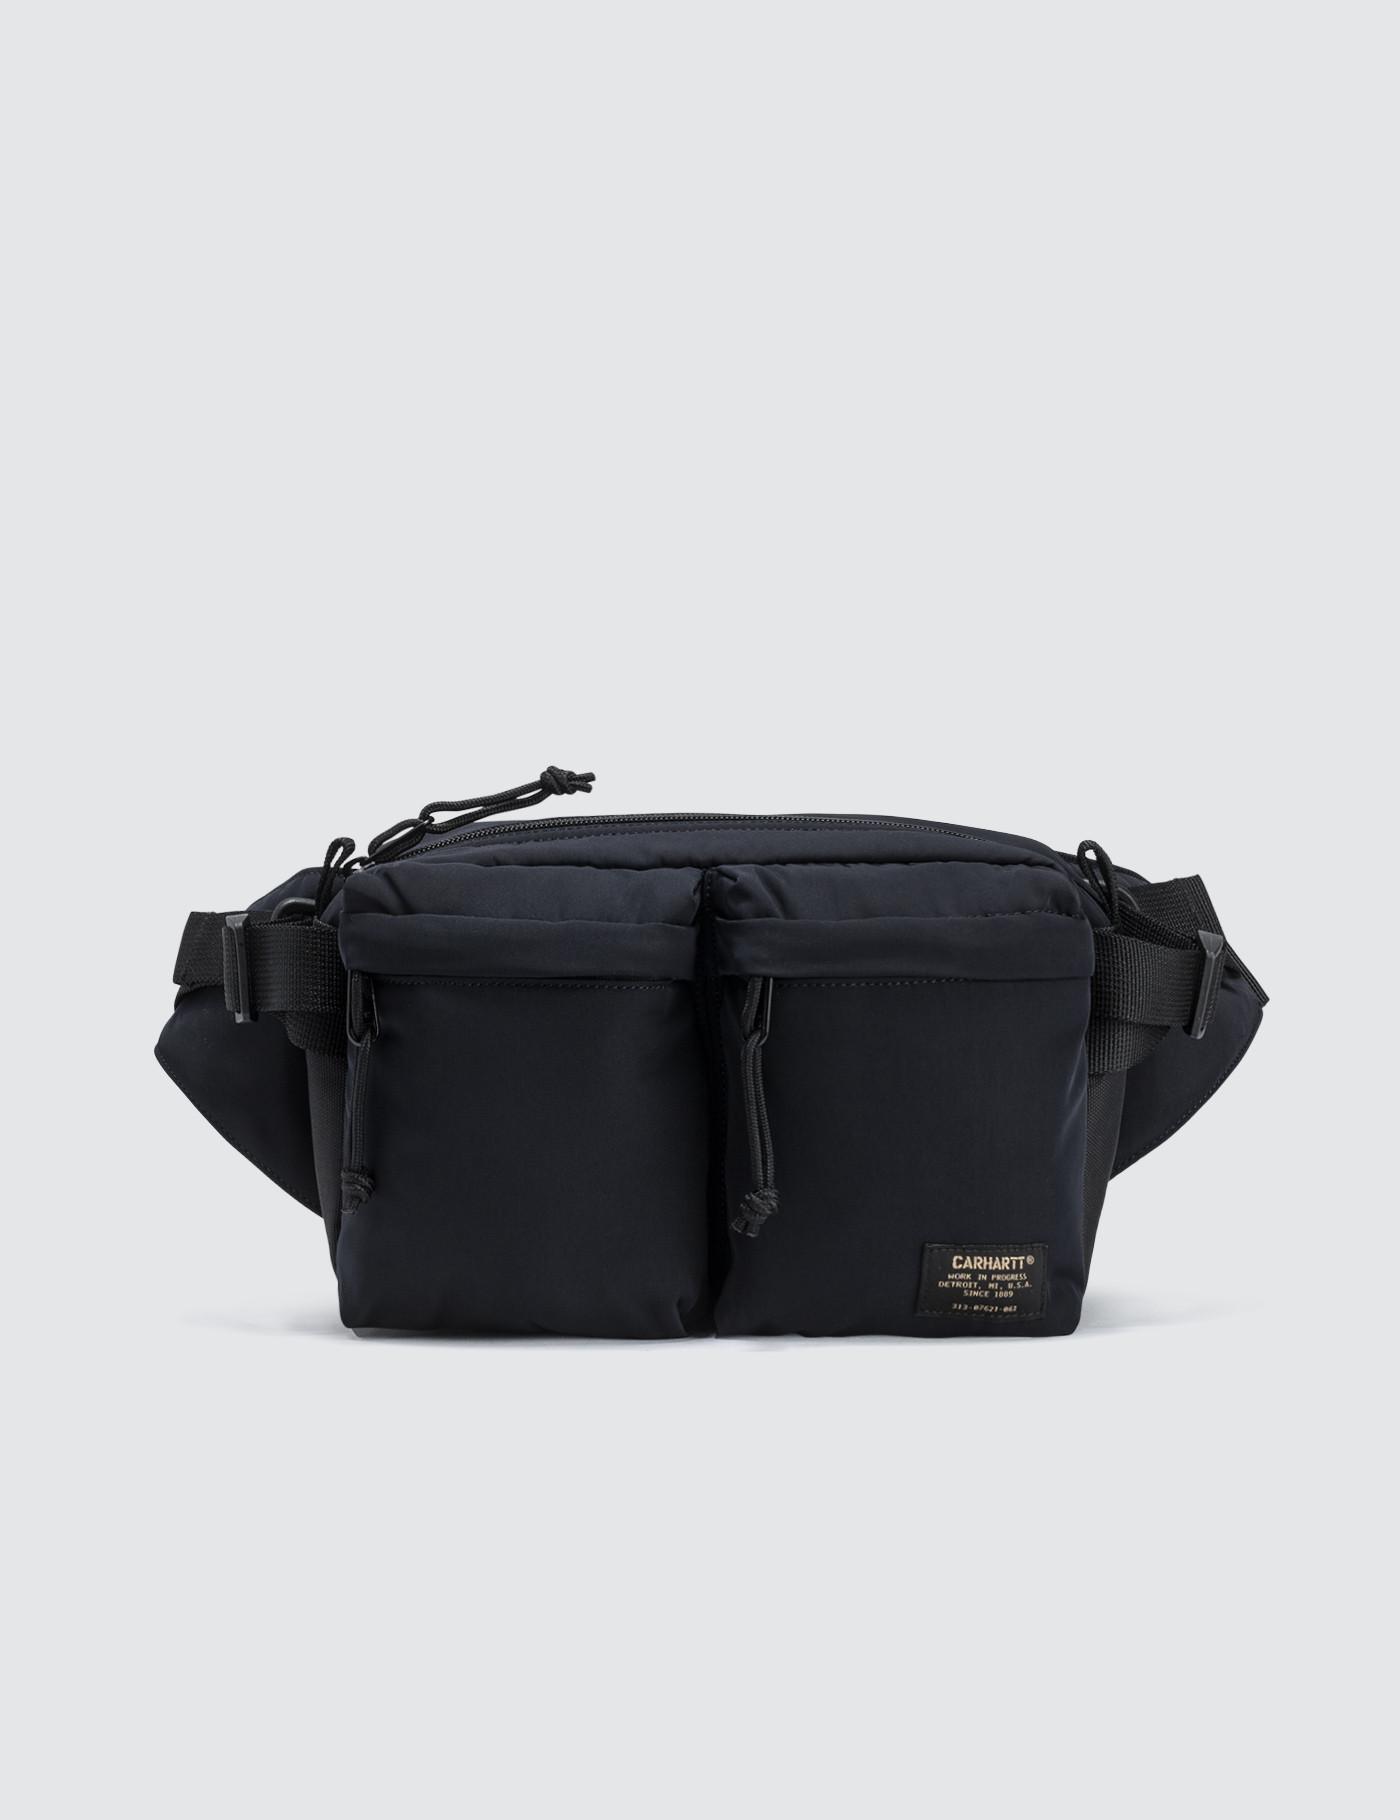 Lyst - Carhartt WIP Military Hip Bag in Blue for Men 2dd0a354187d0